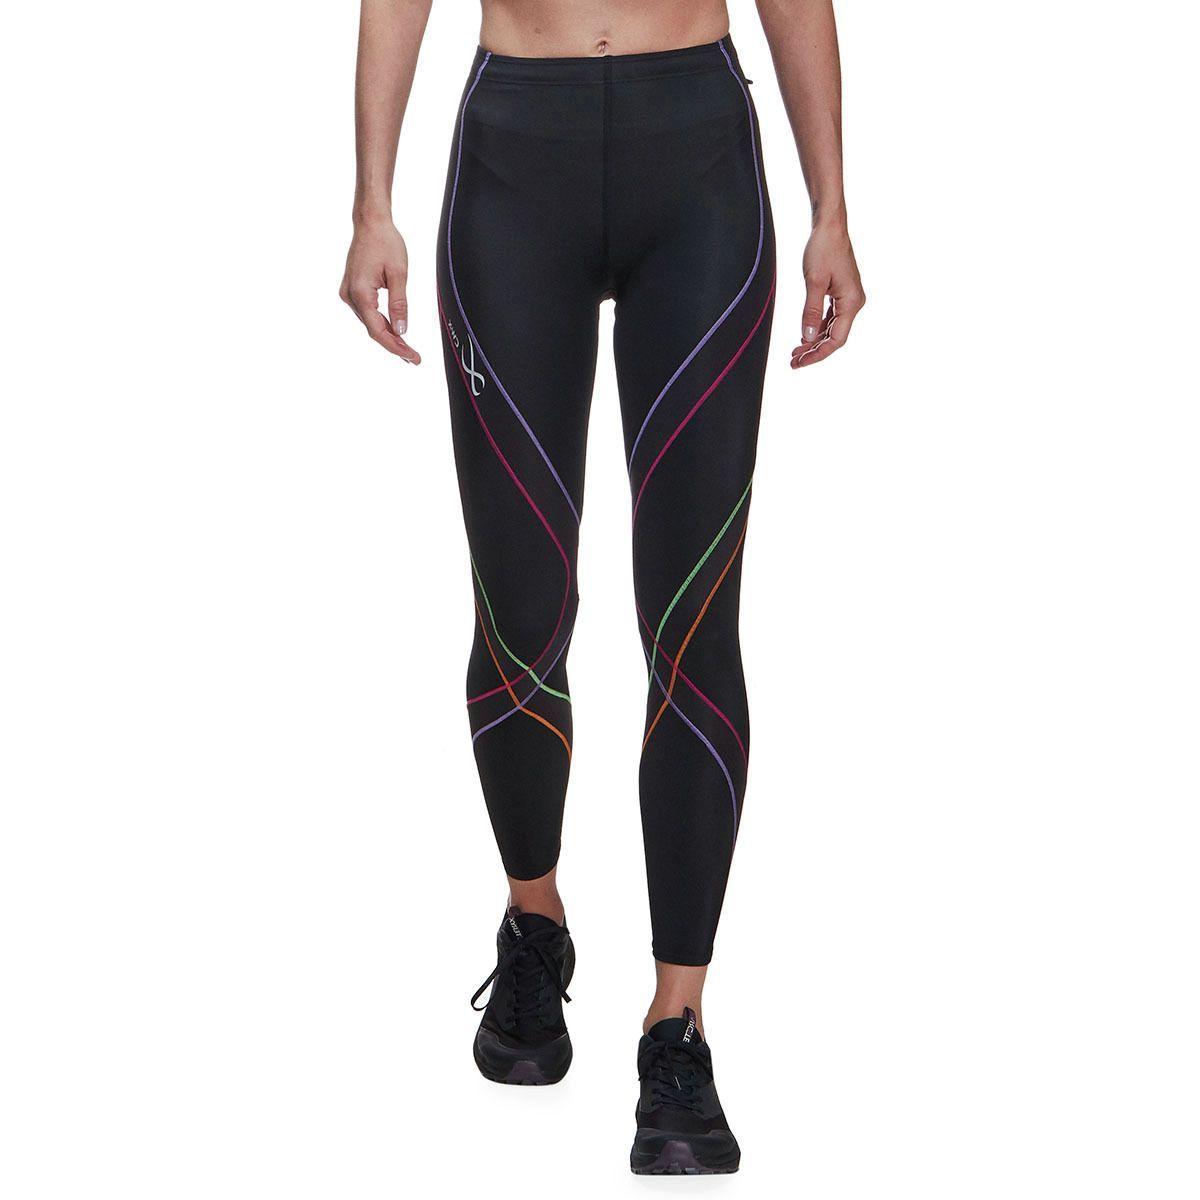 CW-X Endurance Pro Tight - Women's